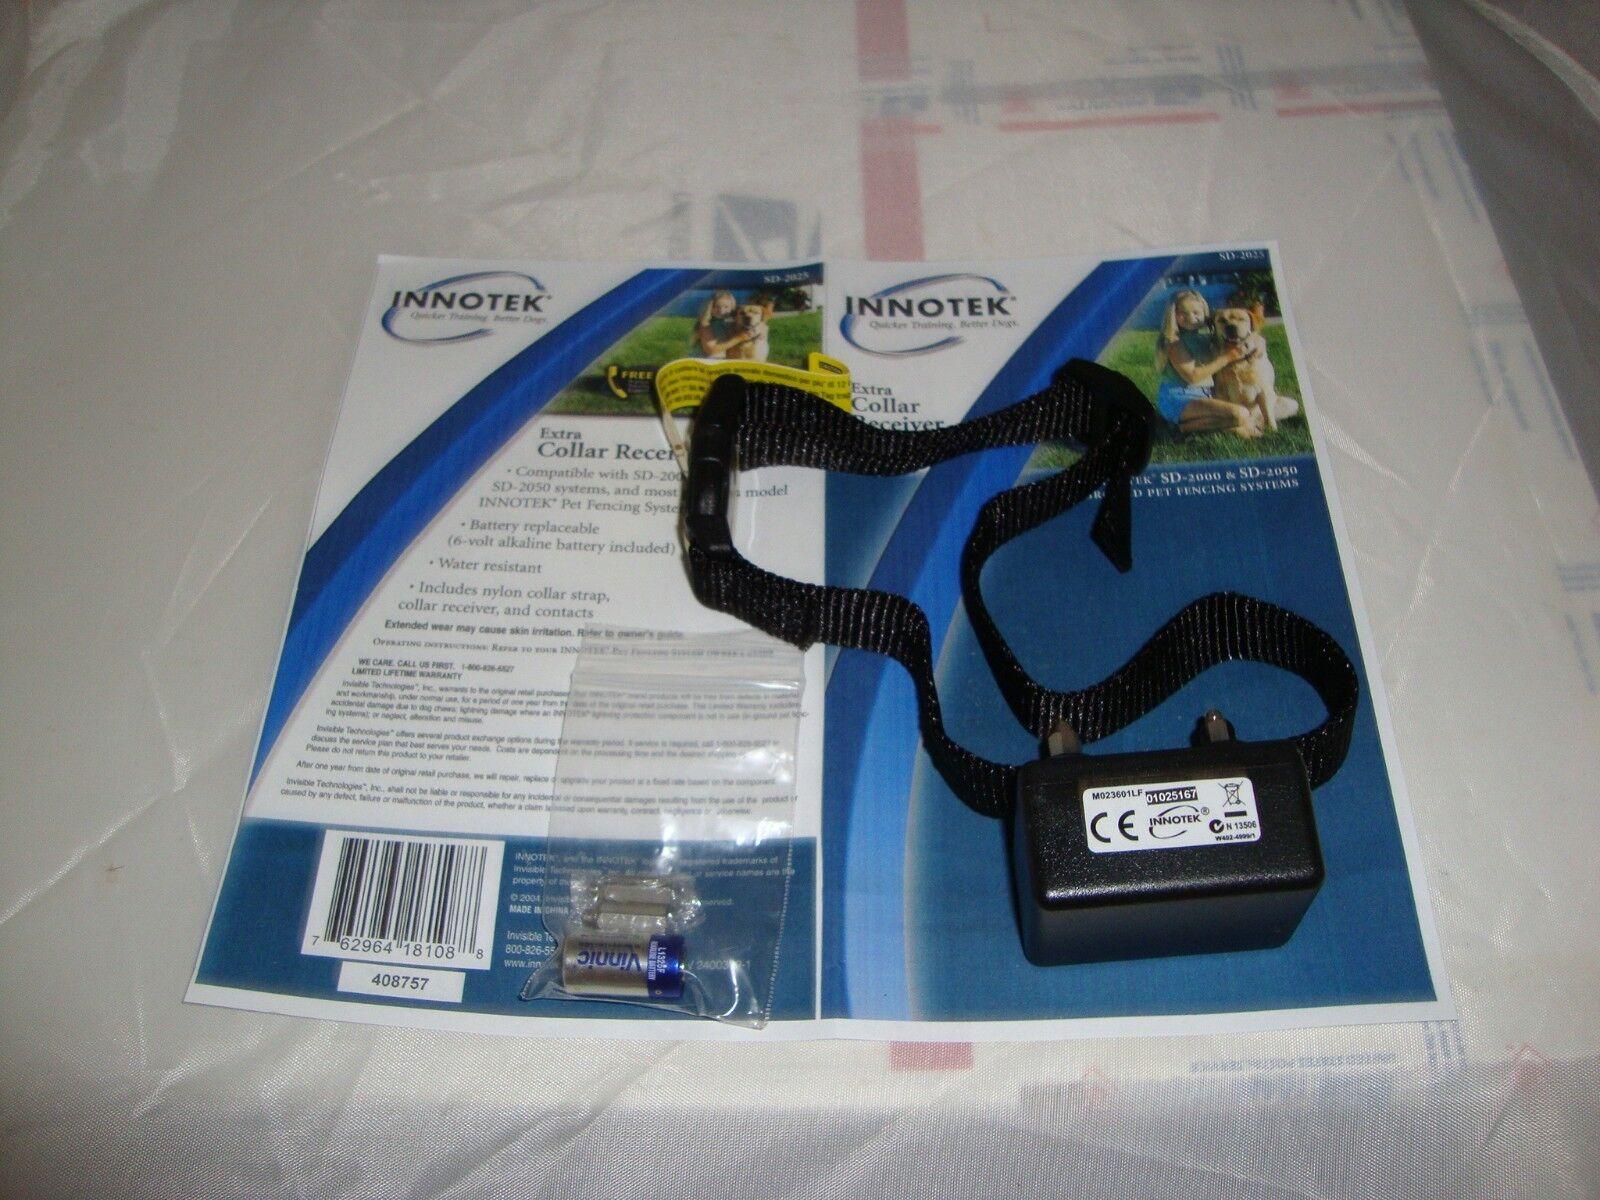 Innotek Extra Receiver Collar for Item# 37790